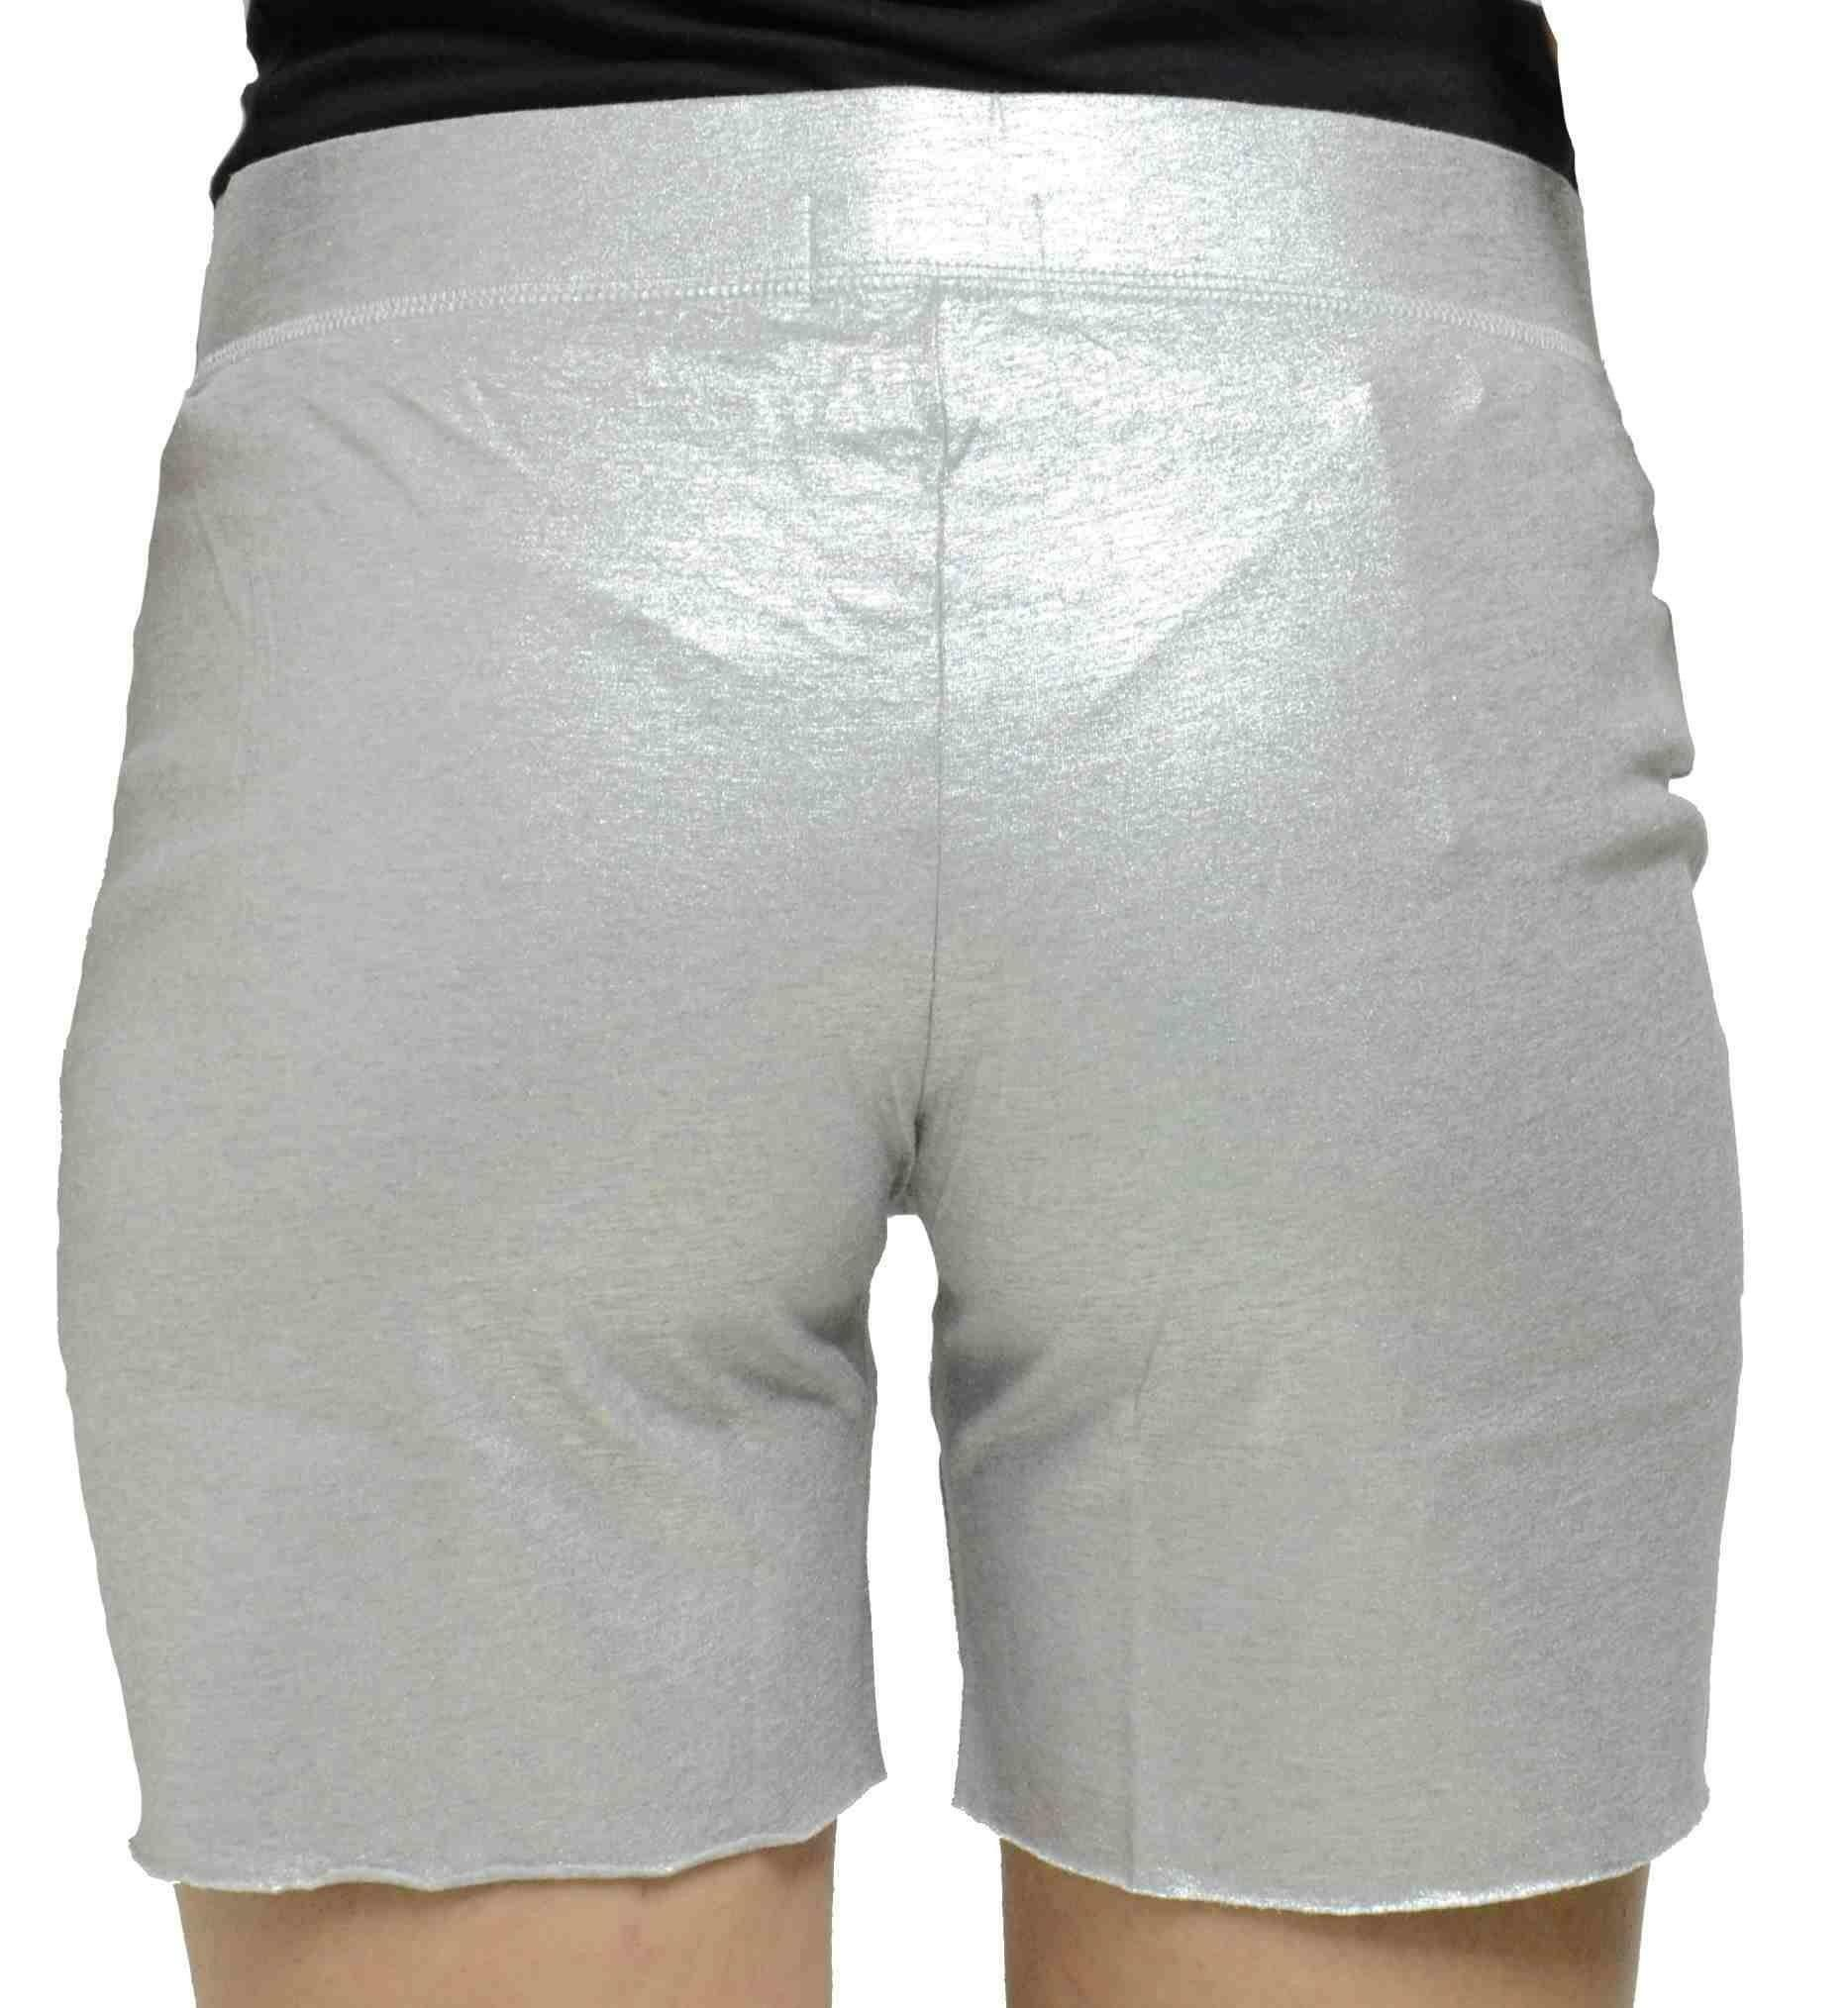 converse converse short raw cut pantaloncini donna grigio metallico